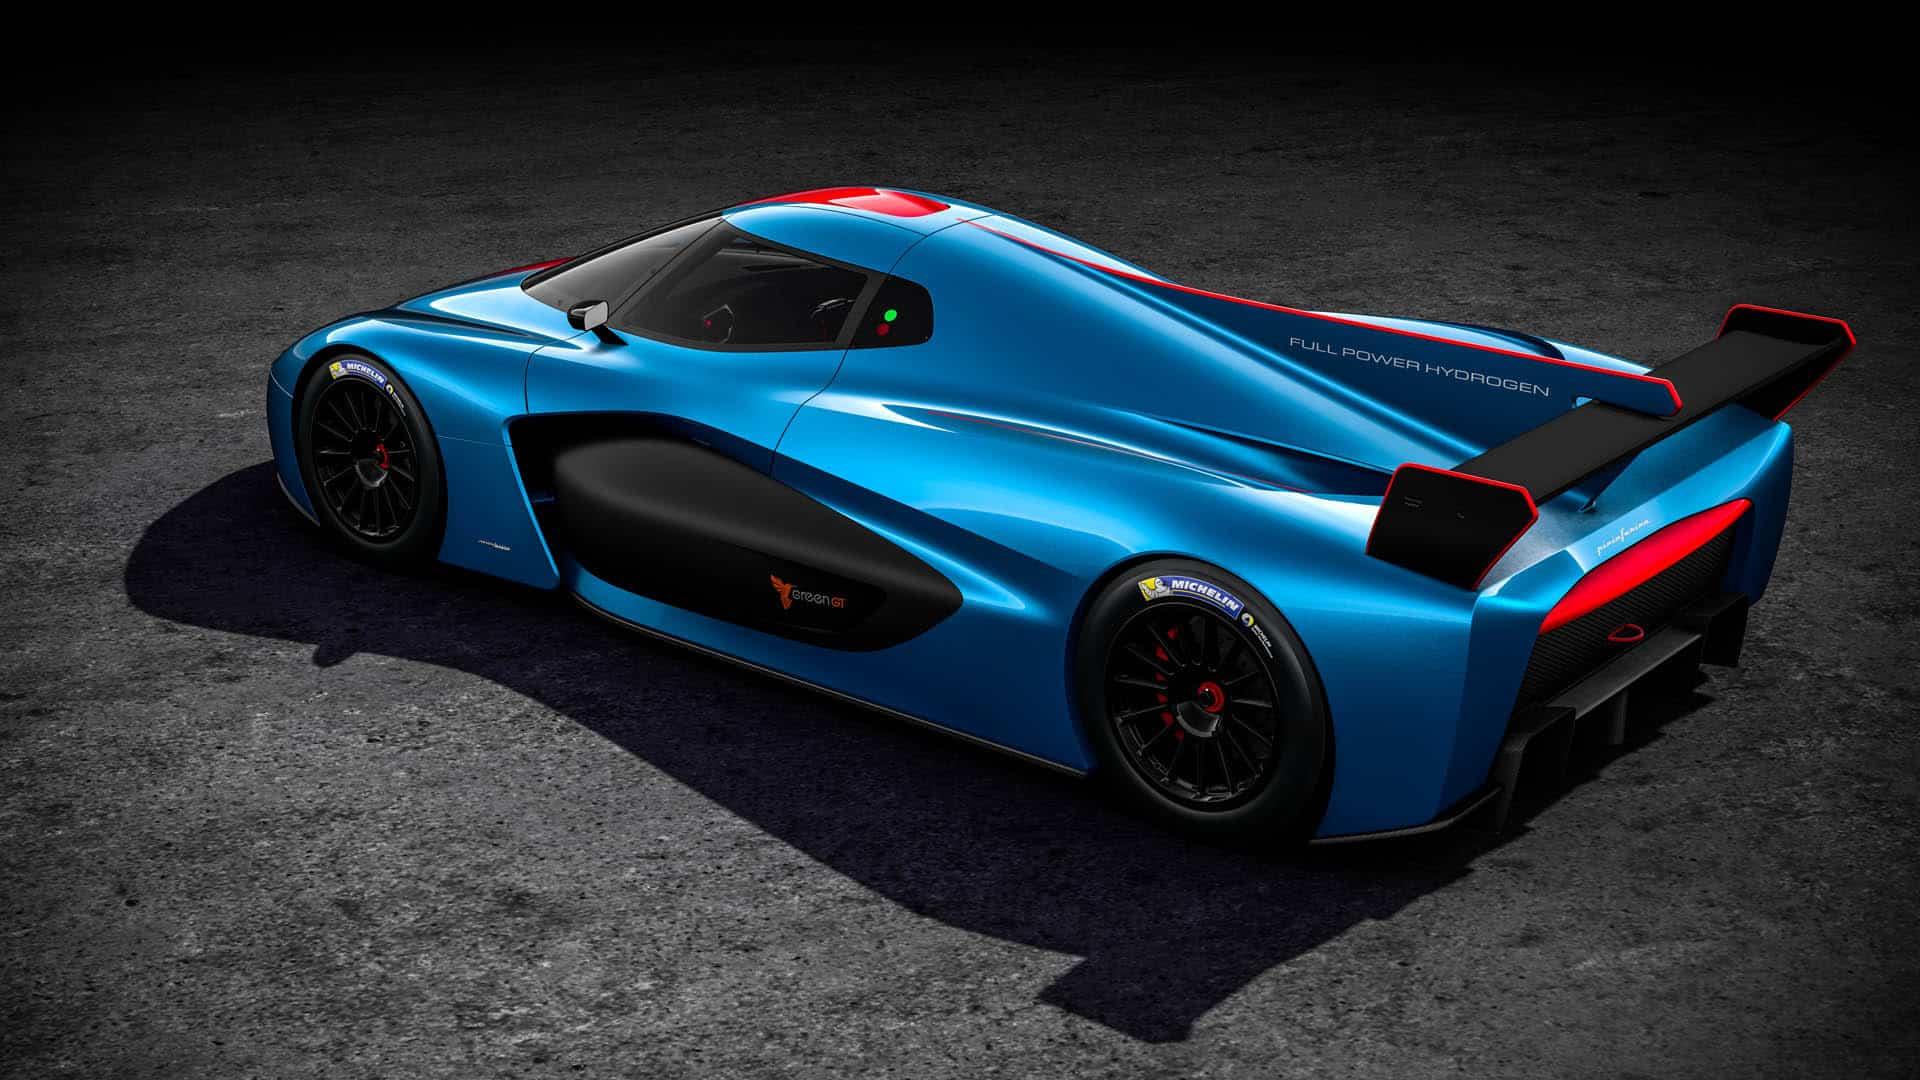 Pininfarina H2 Speed Concept: Pininfarina H2 Speed Hydrogen Track Car Moves Into Production